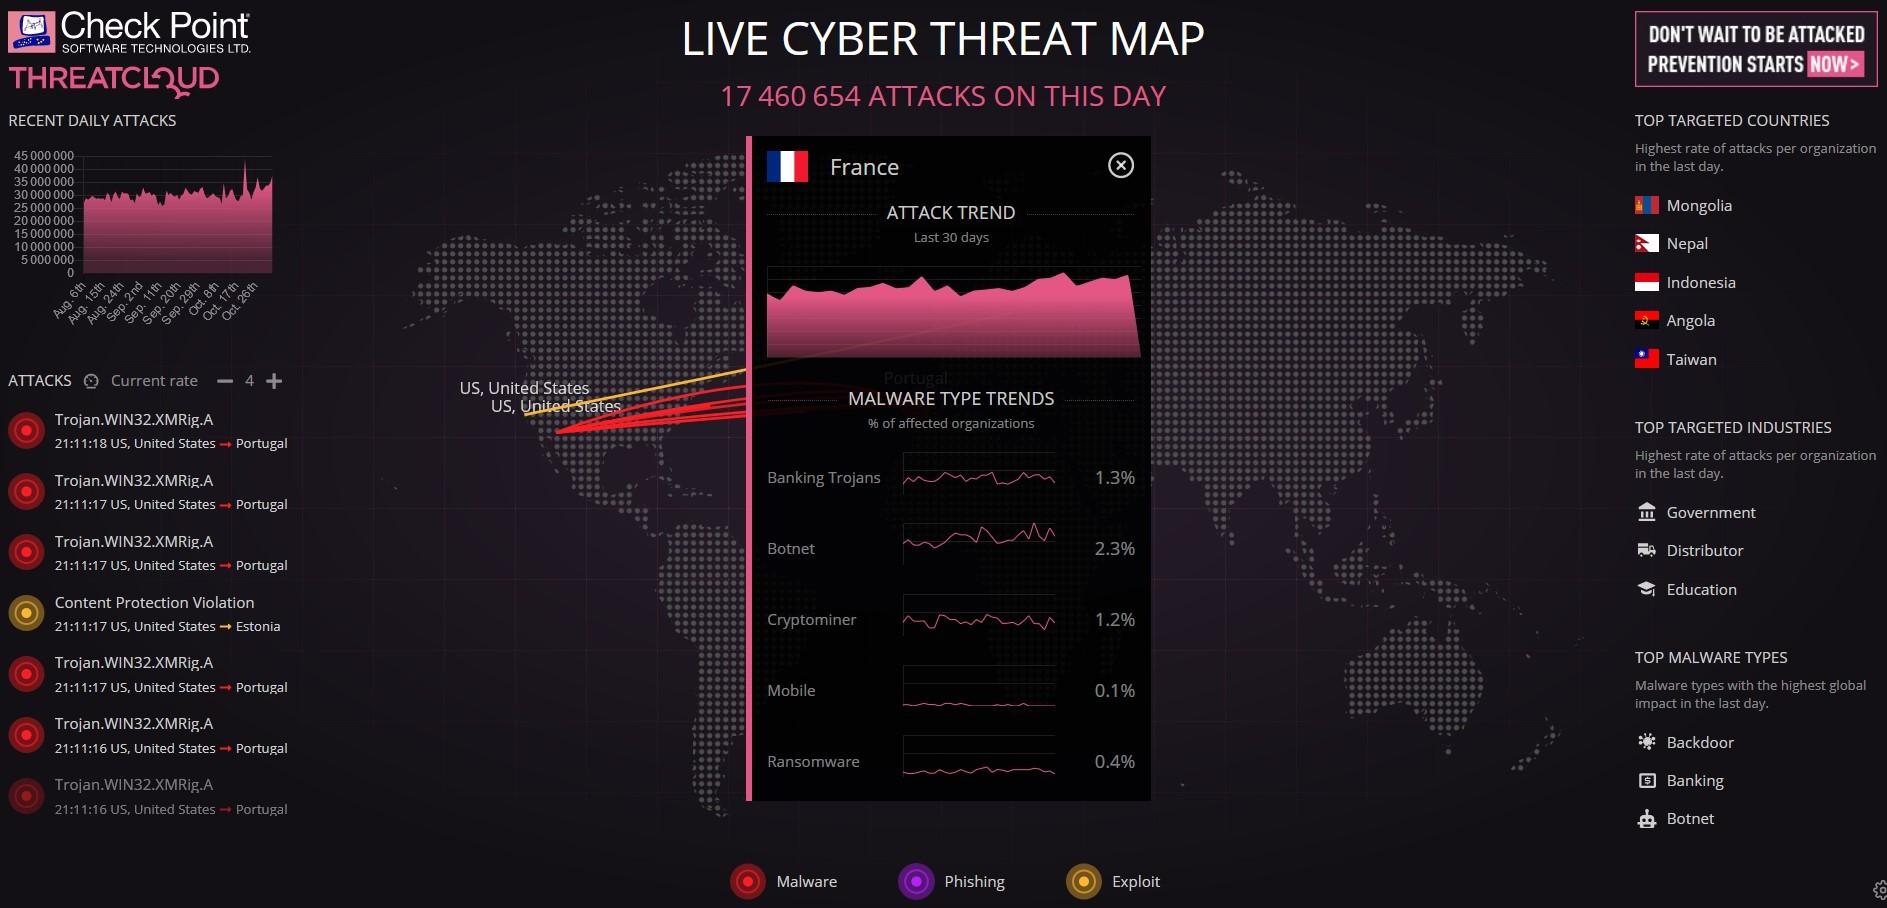 Visualiser les cyberattaques en temps réel